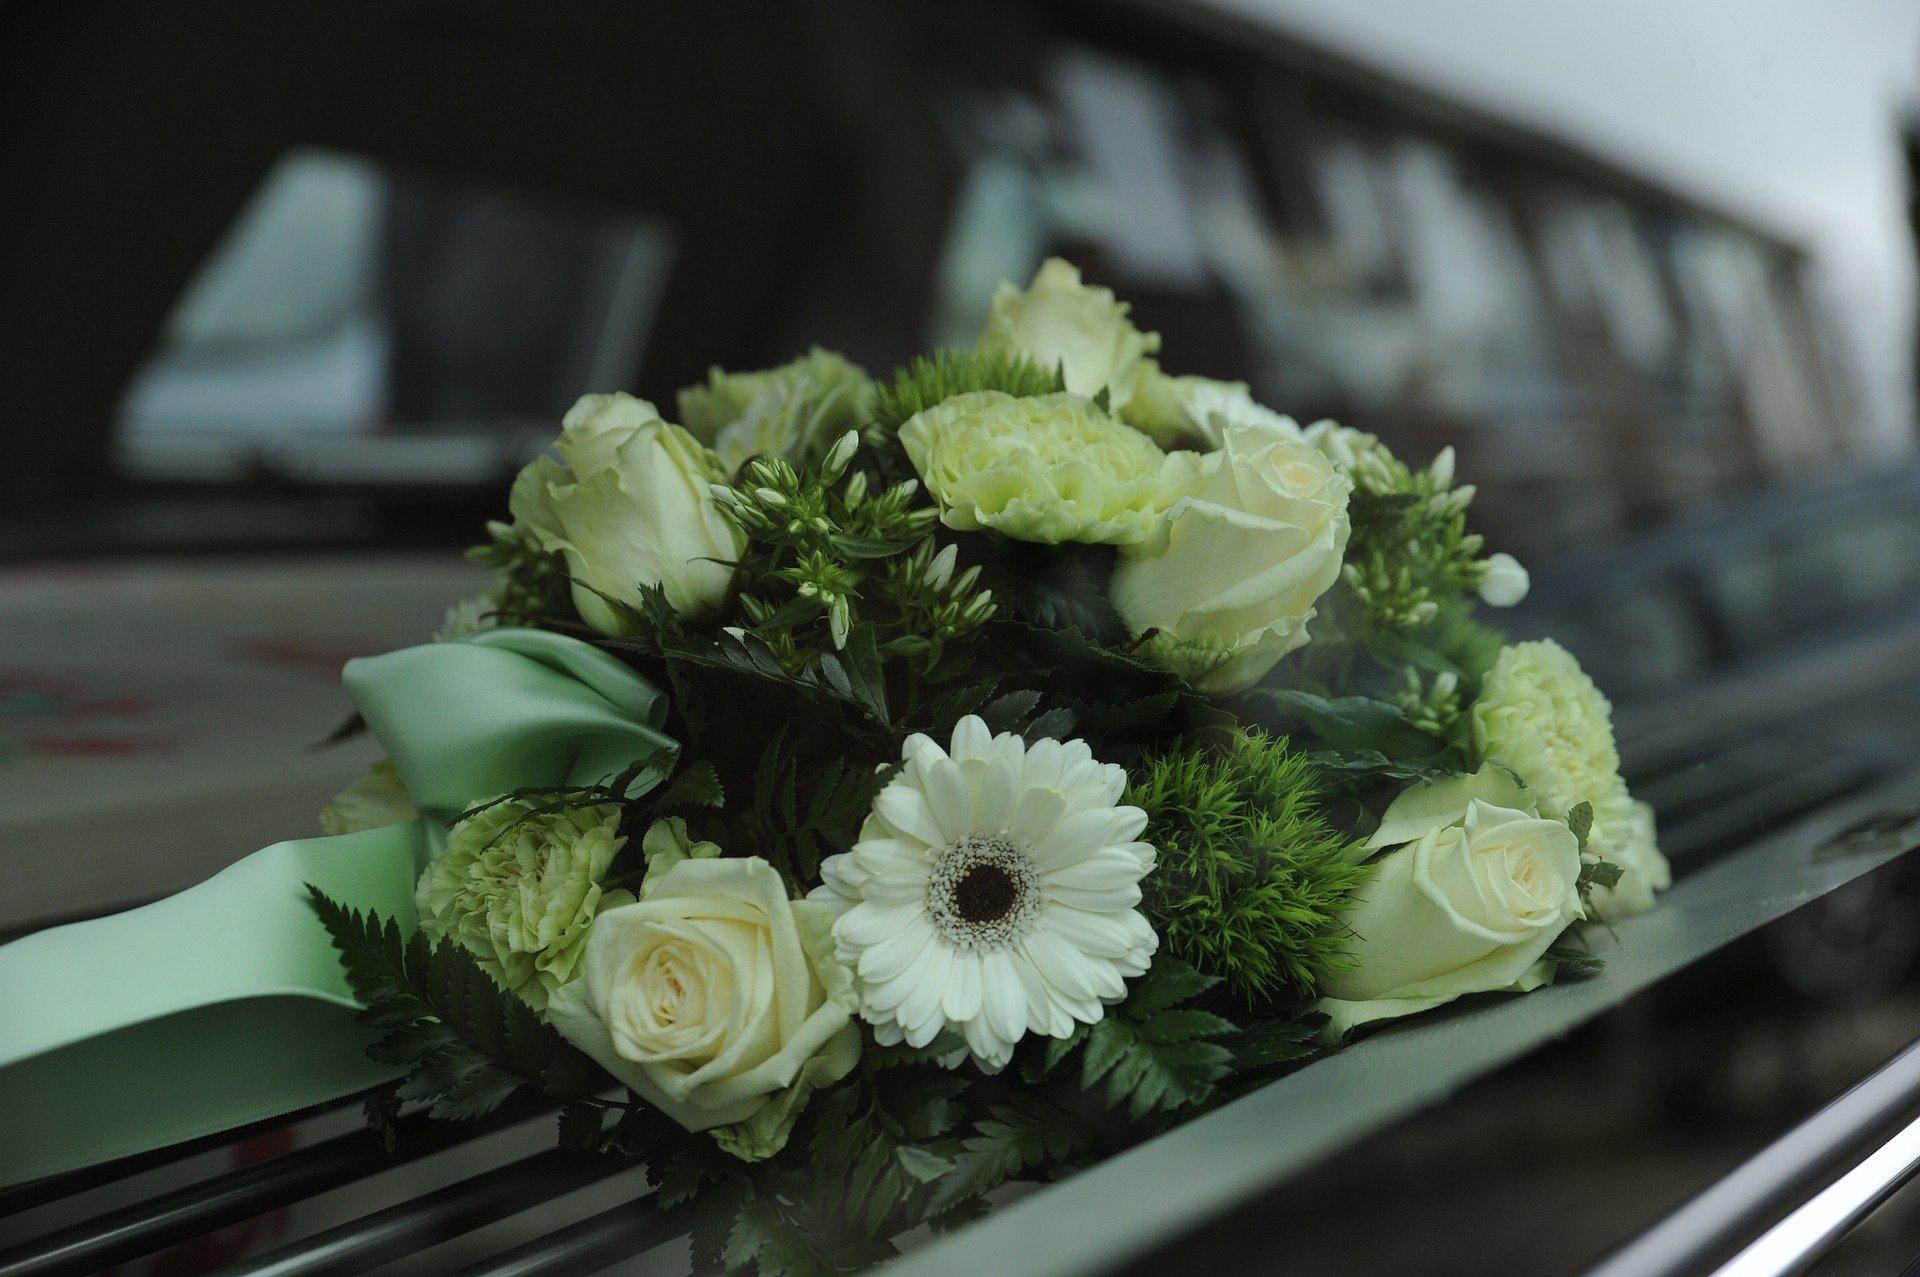 flowers 4839339 1920